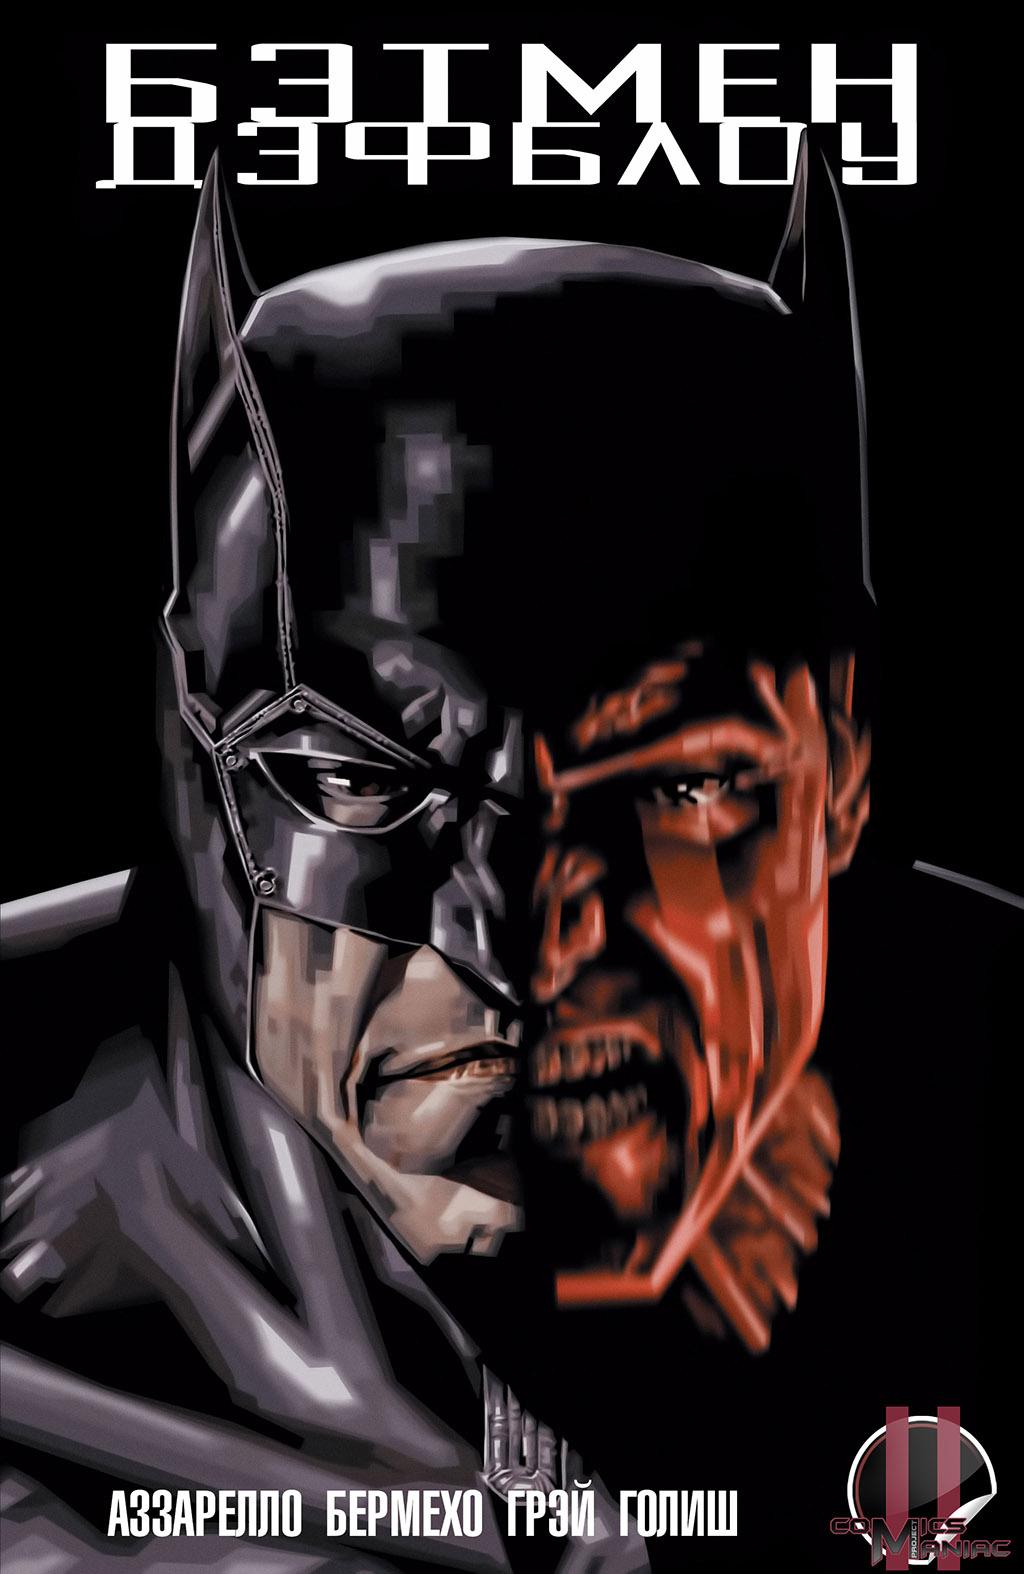 Комикс Бэтмен/Дэфблоу: После Пожара